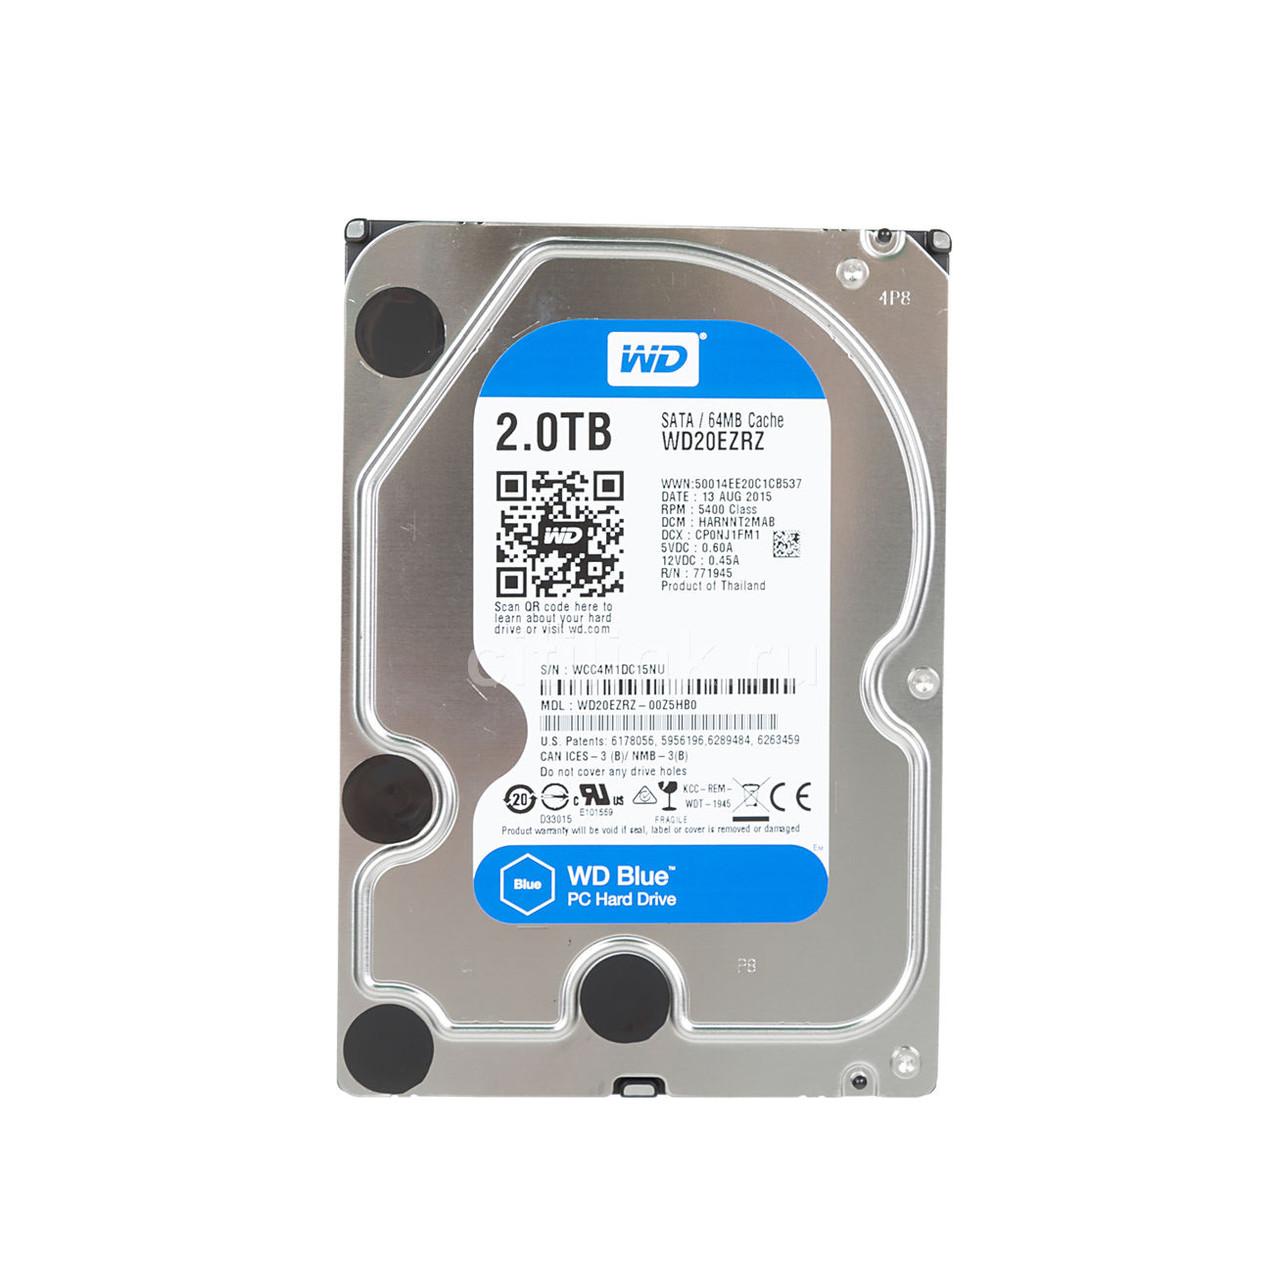 Жесткий диск внутренний Western Digital (WD) Blue (2Тб (2000Гб), HDD, 3,5″, Для компьютеров, SATA) WD20EZRZ